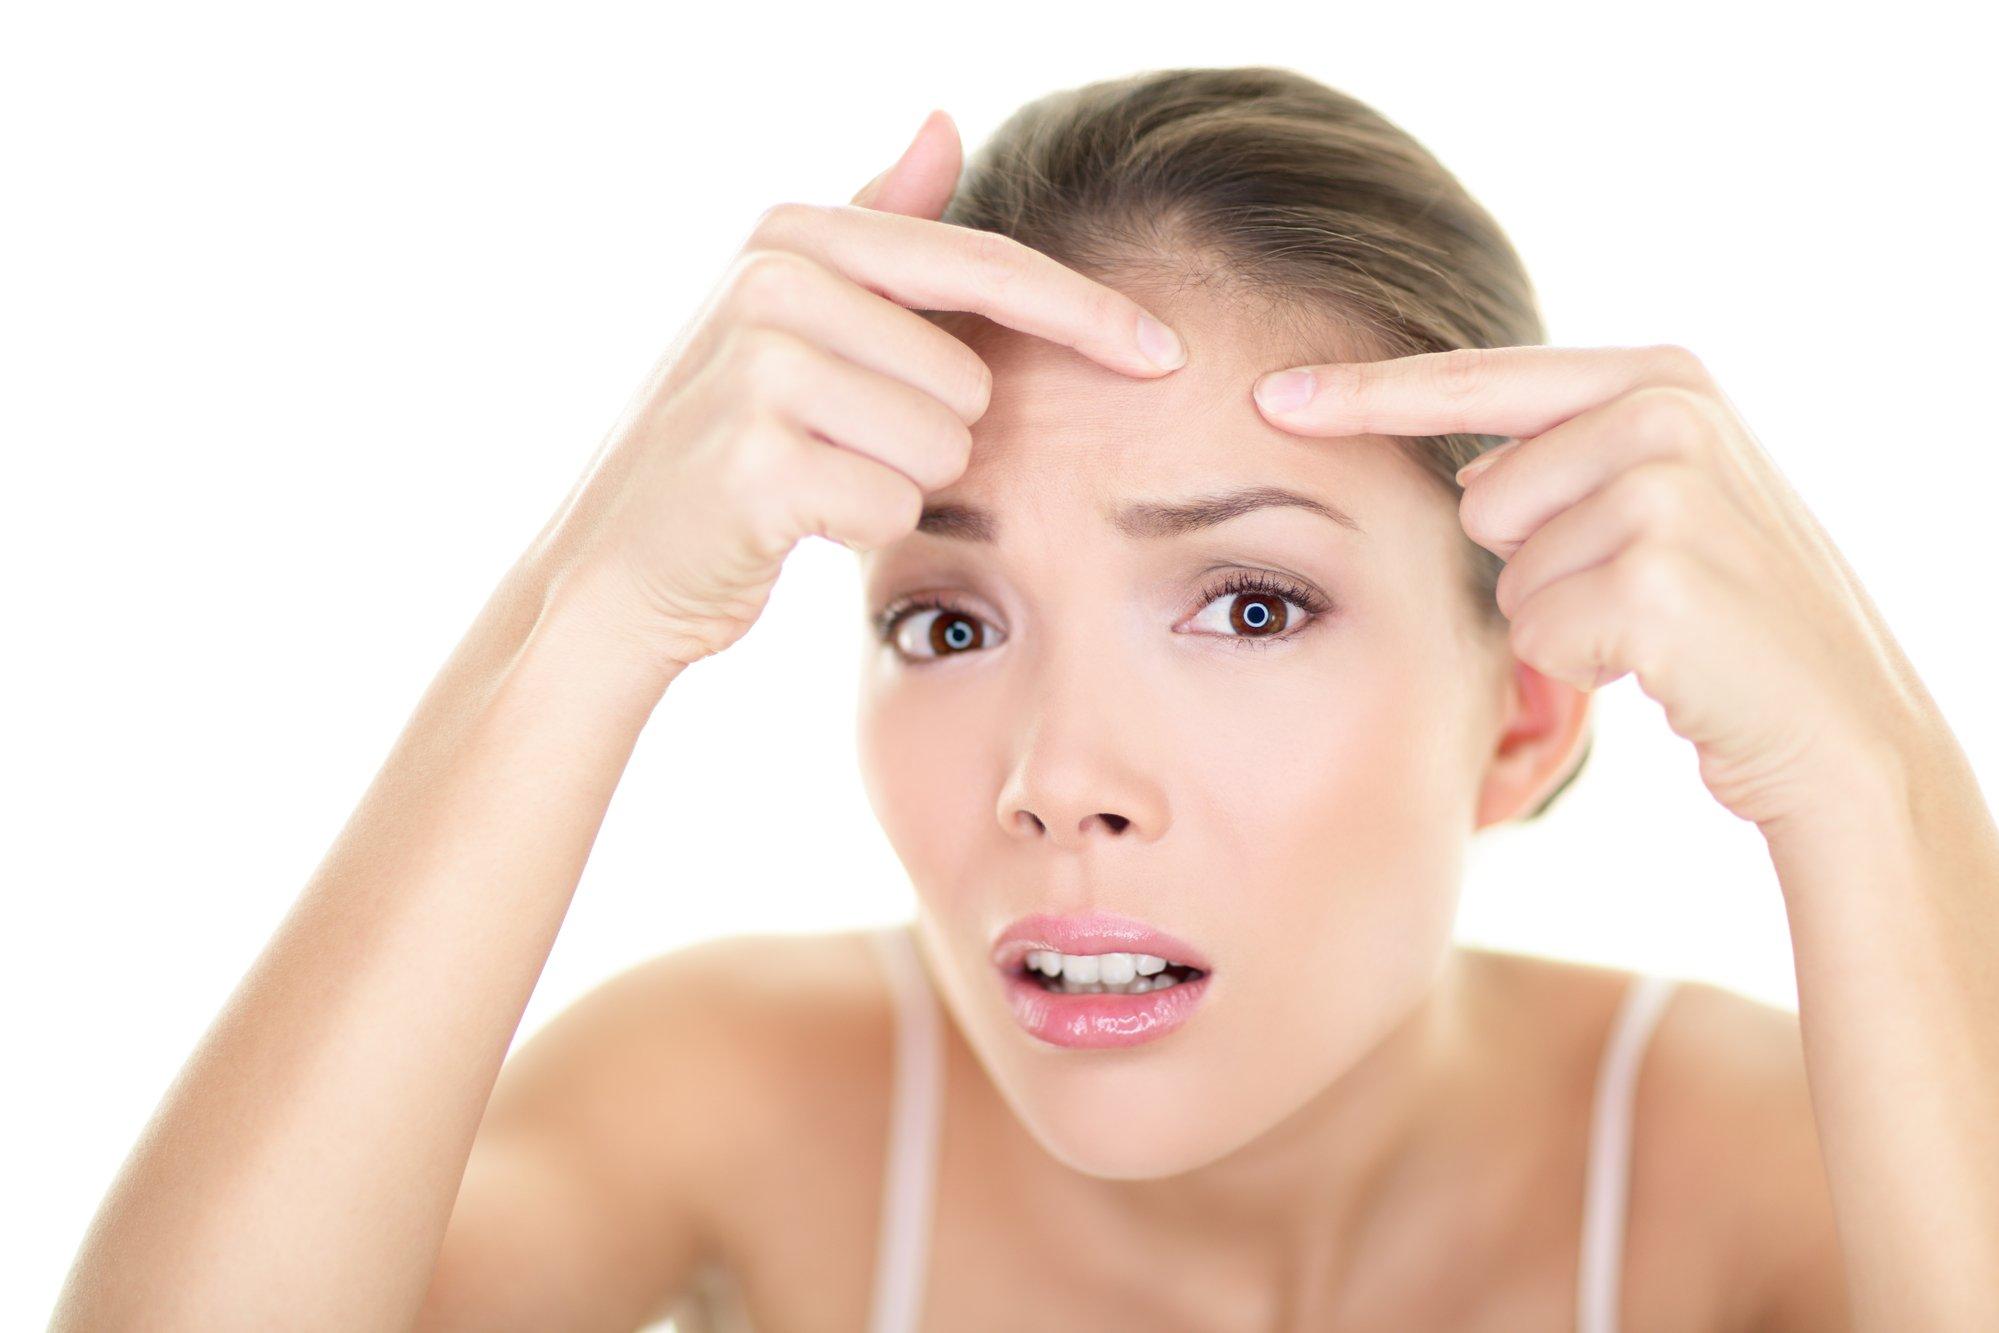 Acne spot pimple - skin care girl and skin problem